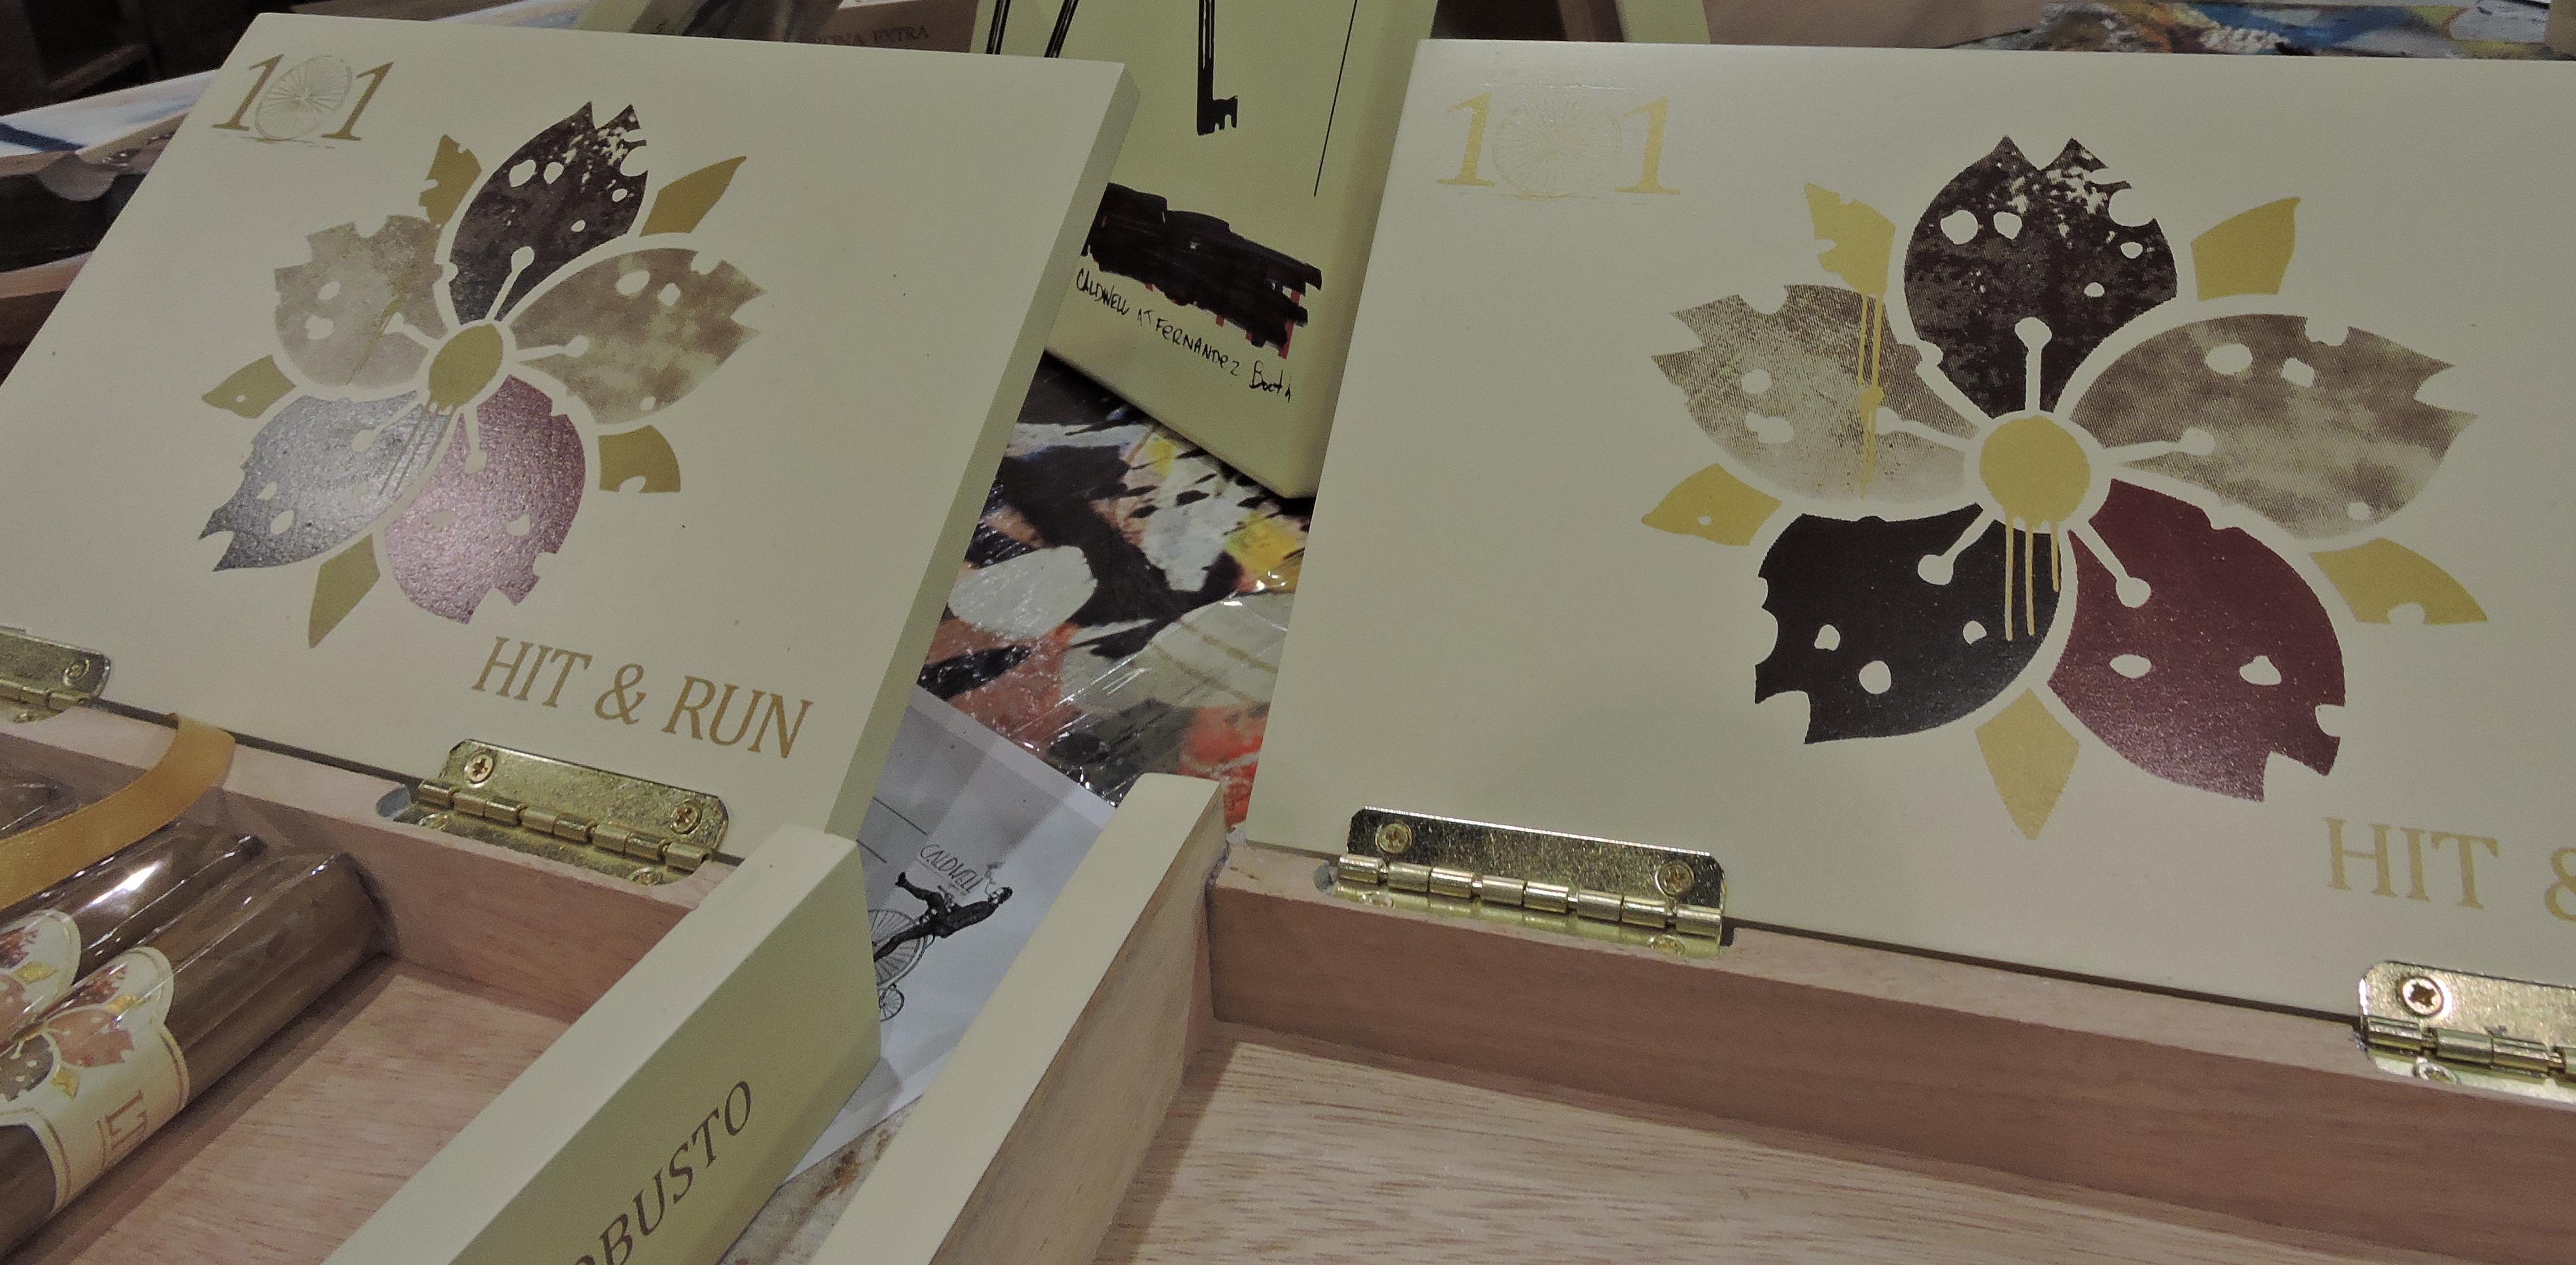 Hit & Run Packaging